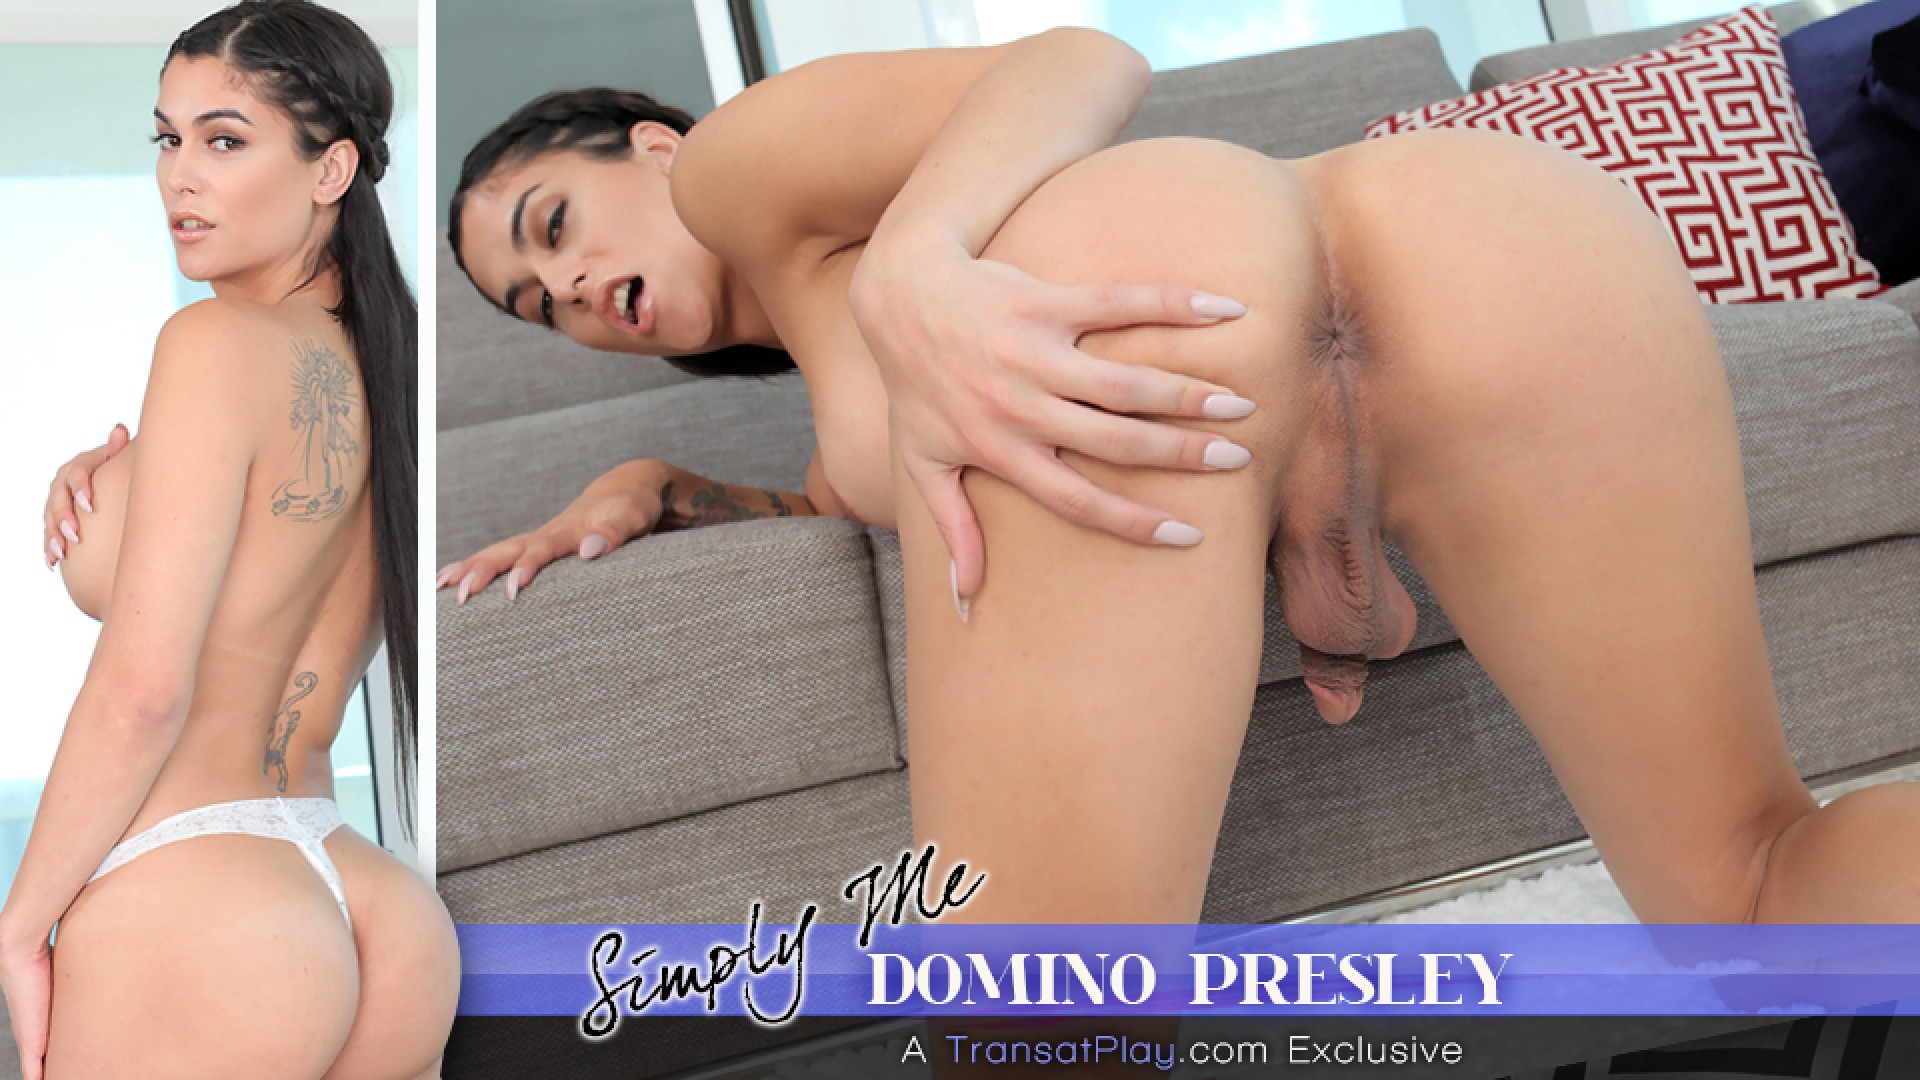 Domino hd порно онлайн